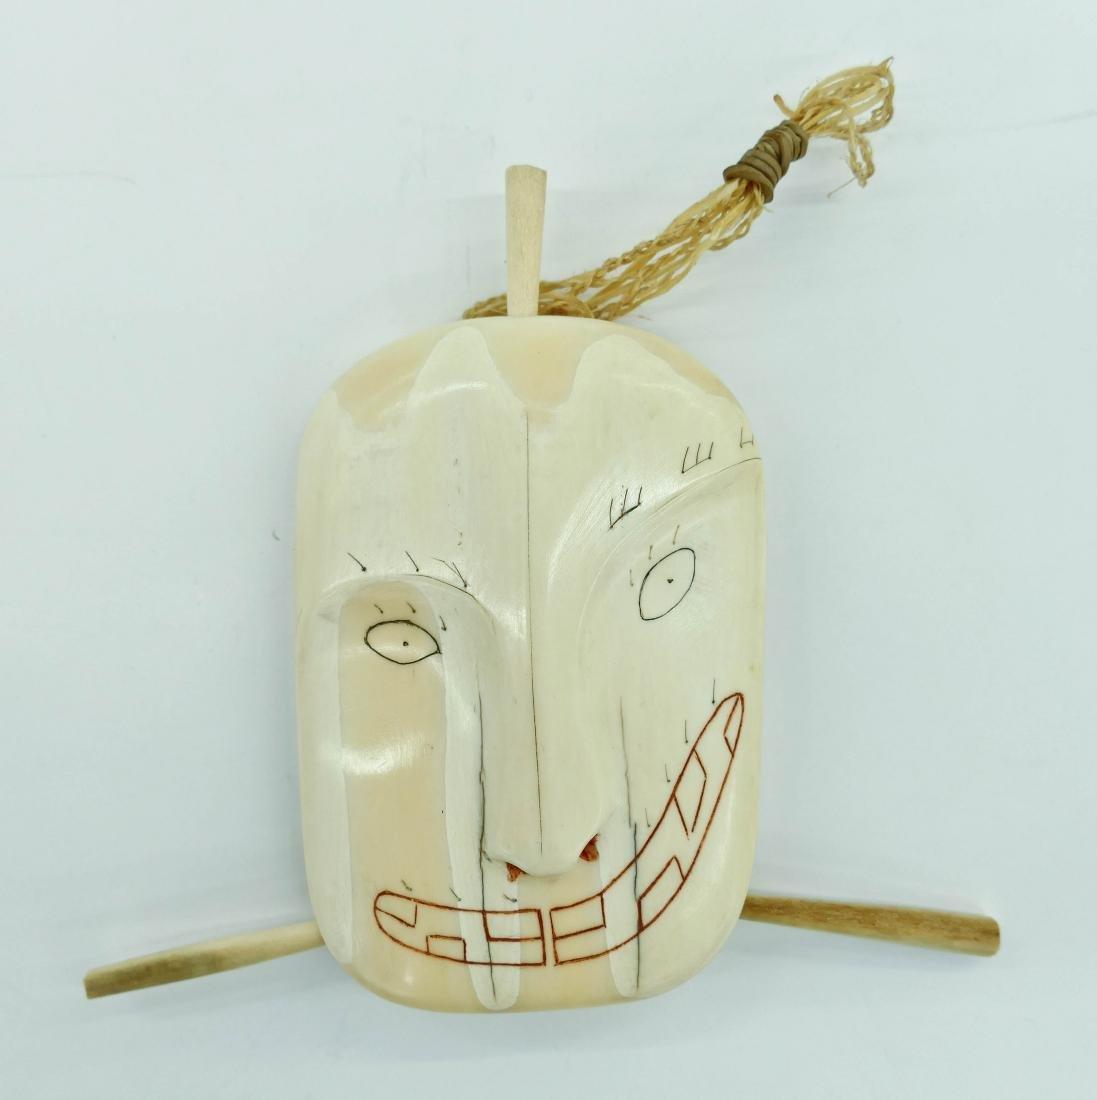 Andrew Noatak (1900-1990 Inuit) Irci Spirit Mask